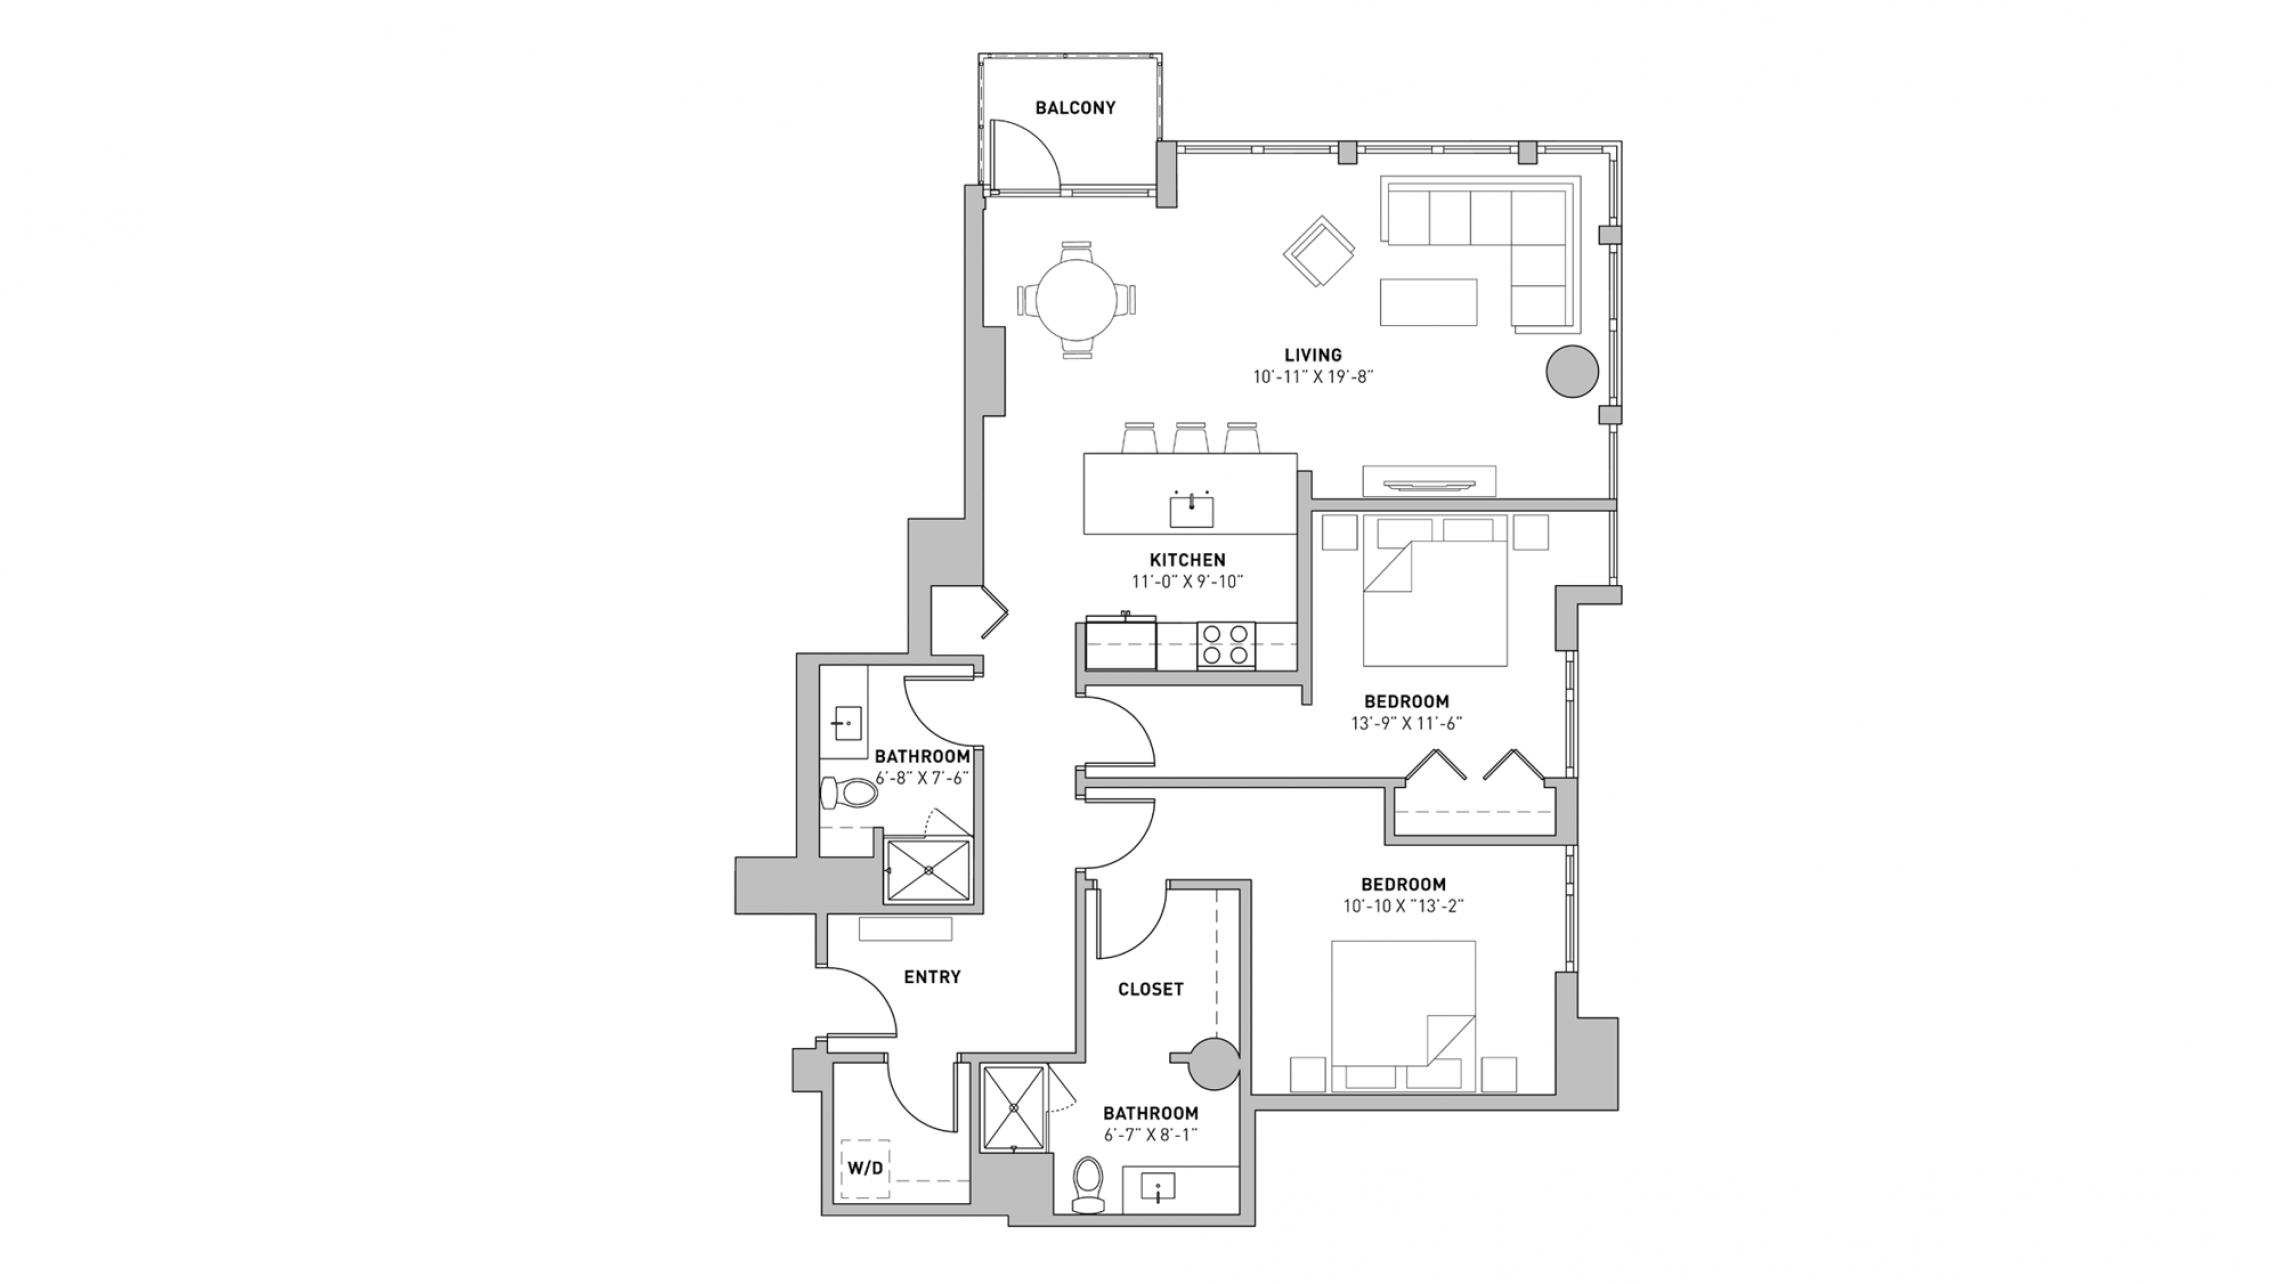 ULI The Pressman 507 - Two Bedroom, Two Bathroom